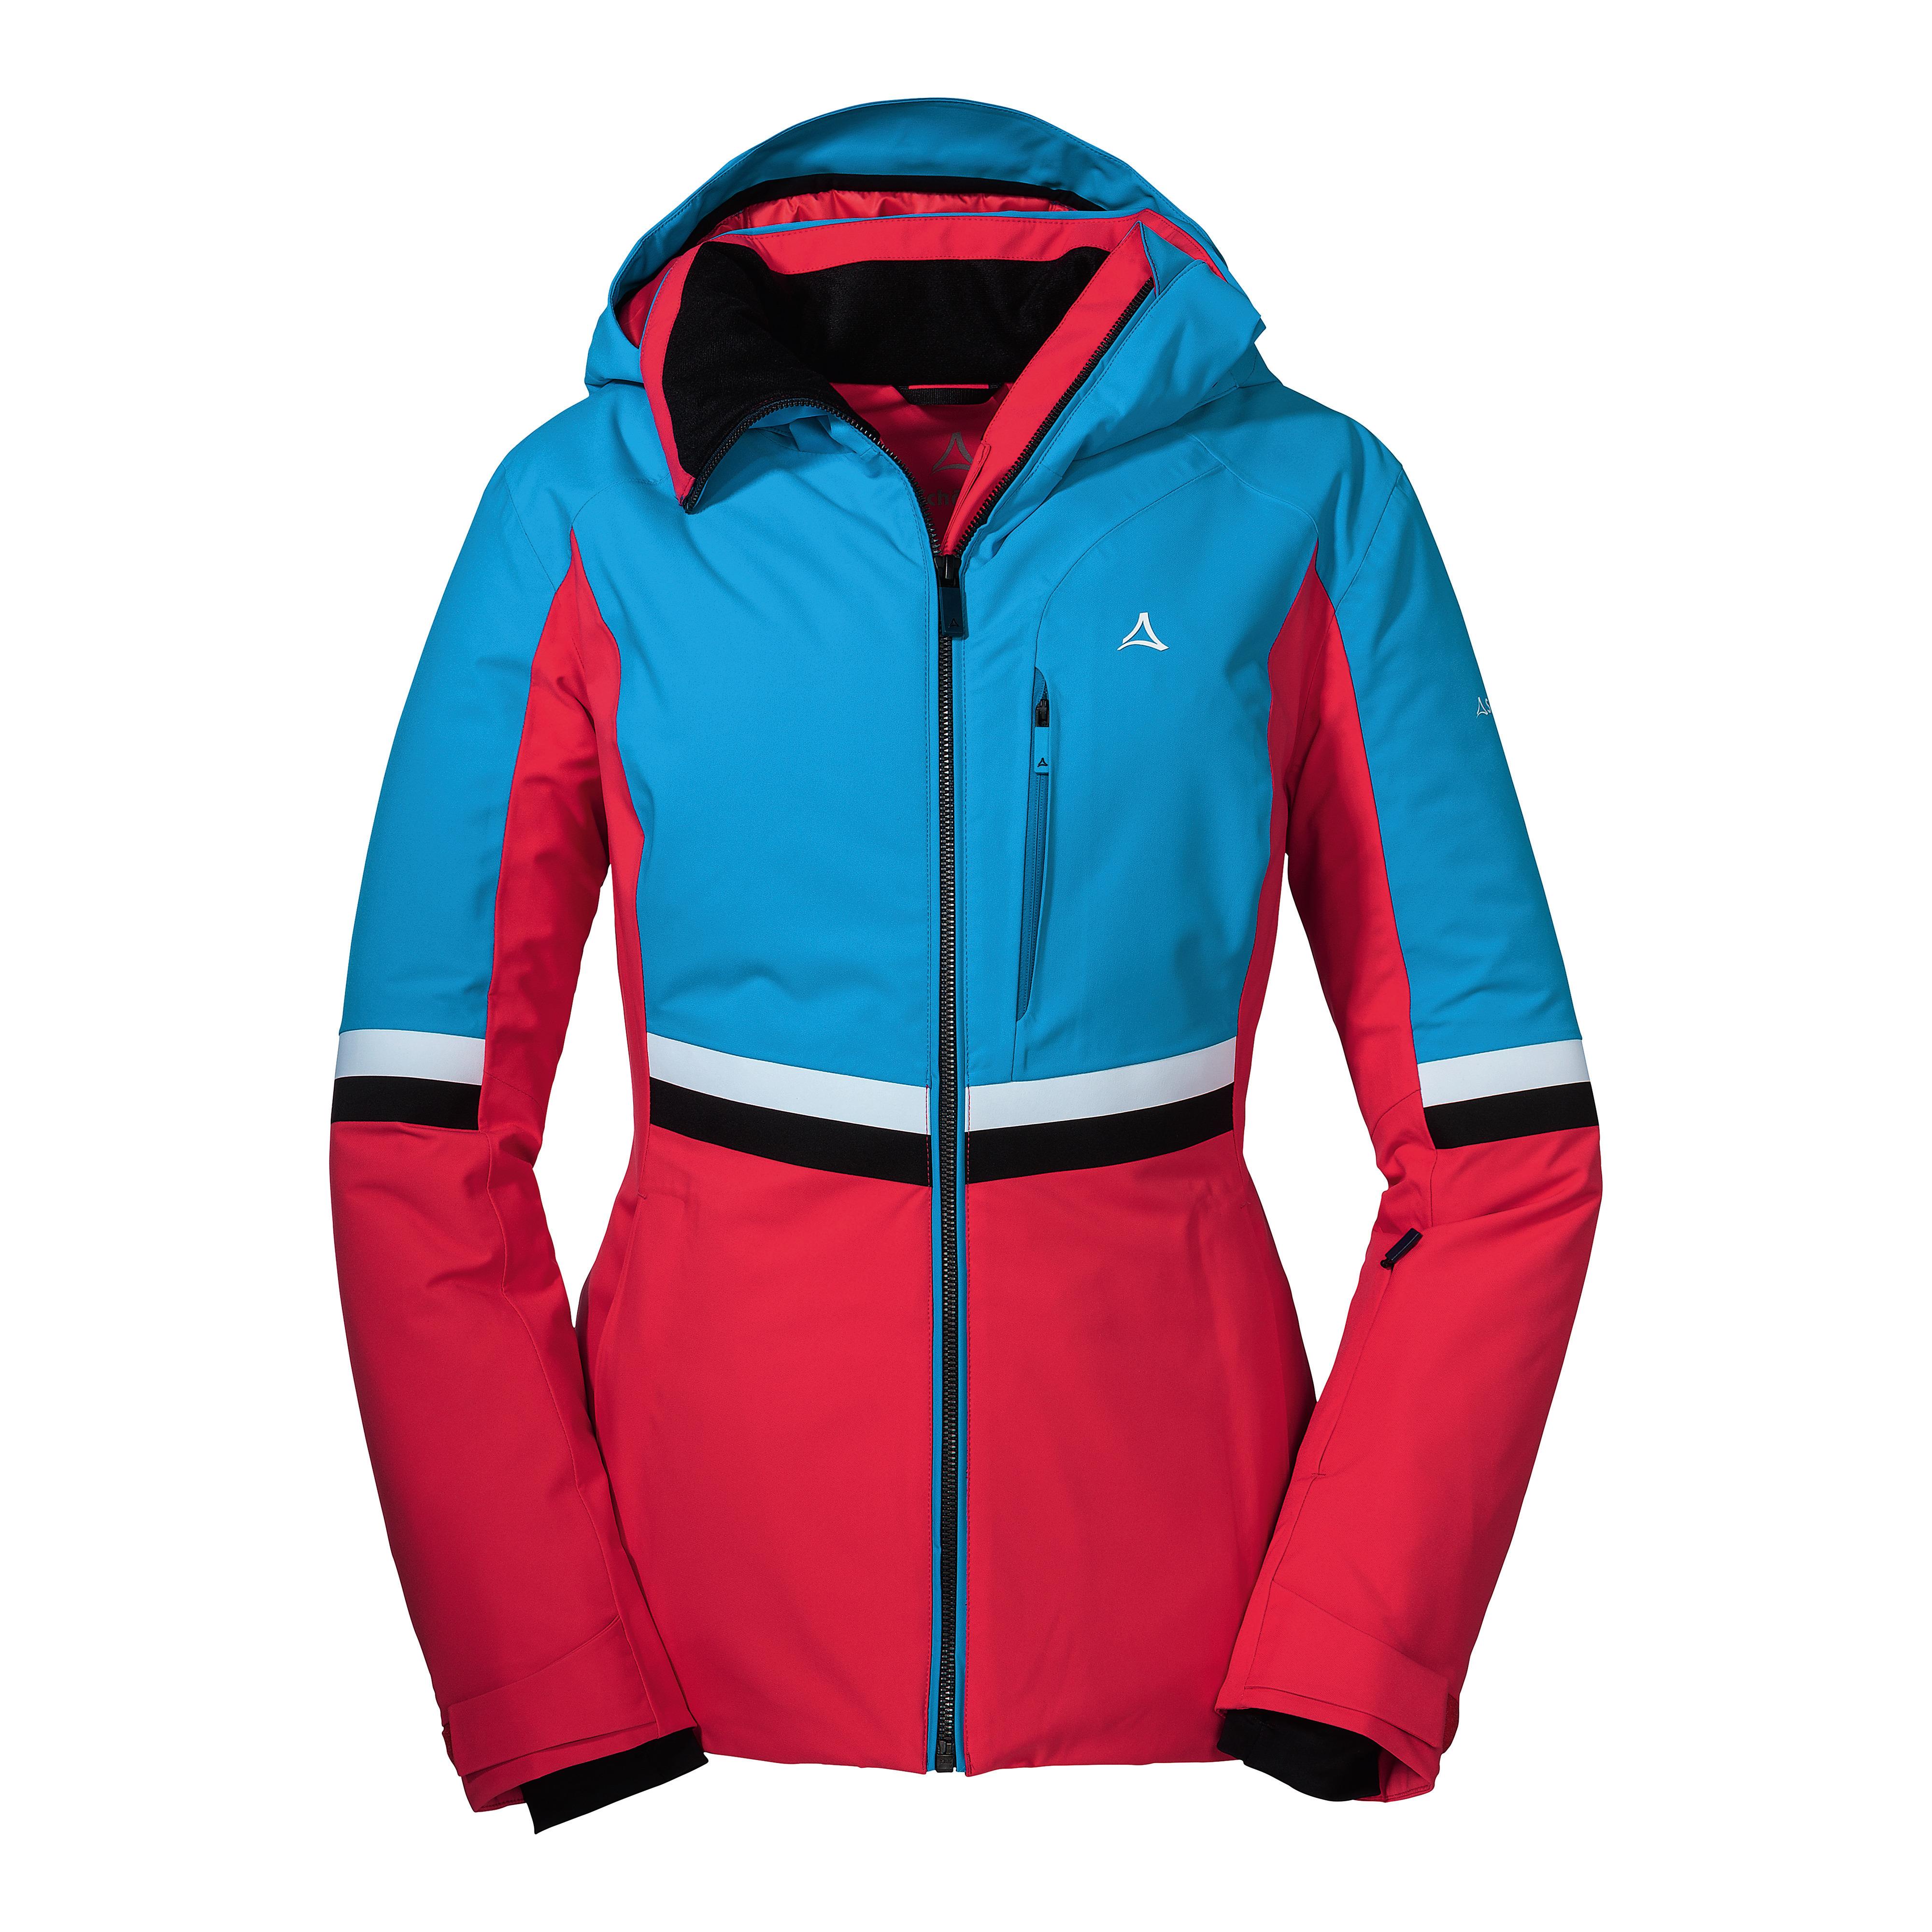 SCHÖFFEL Ski Jacket Carmenna L